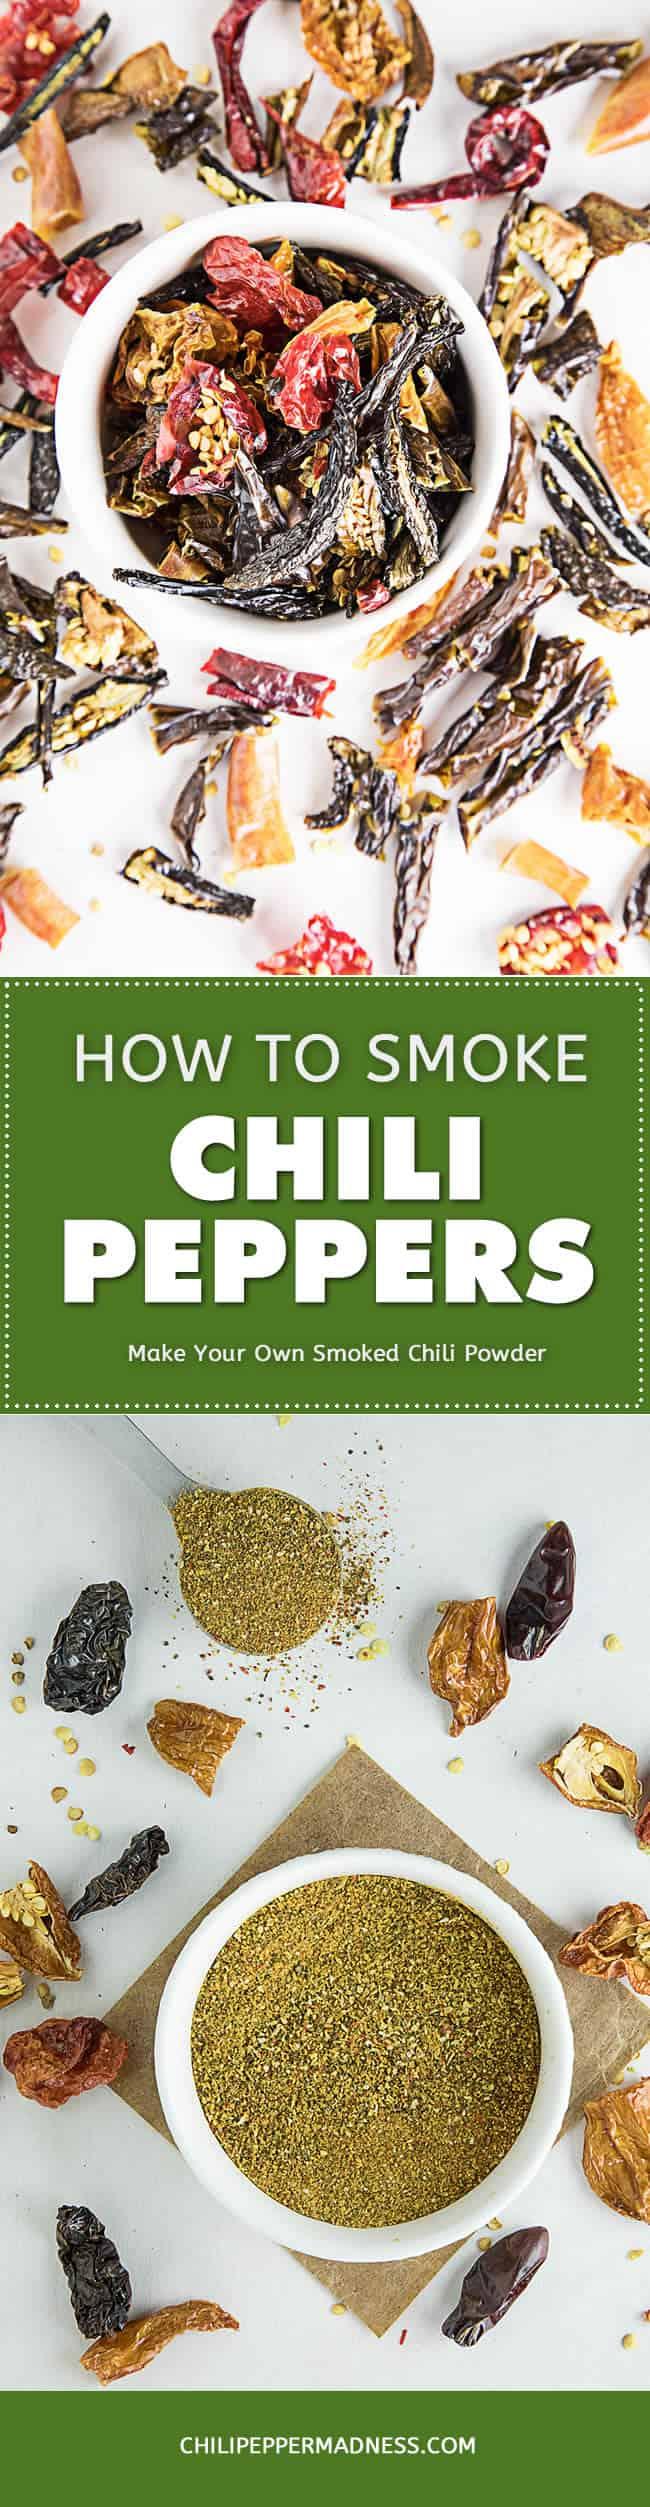 how to Smoke Chili Peppers - Recipe